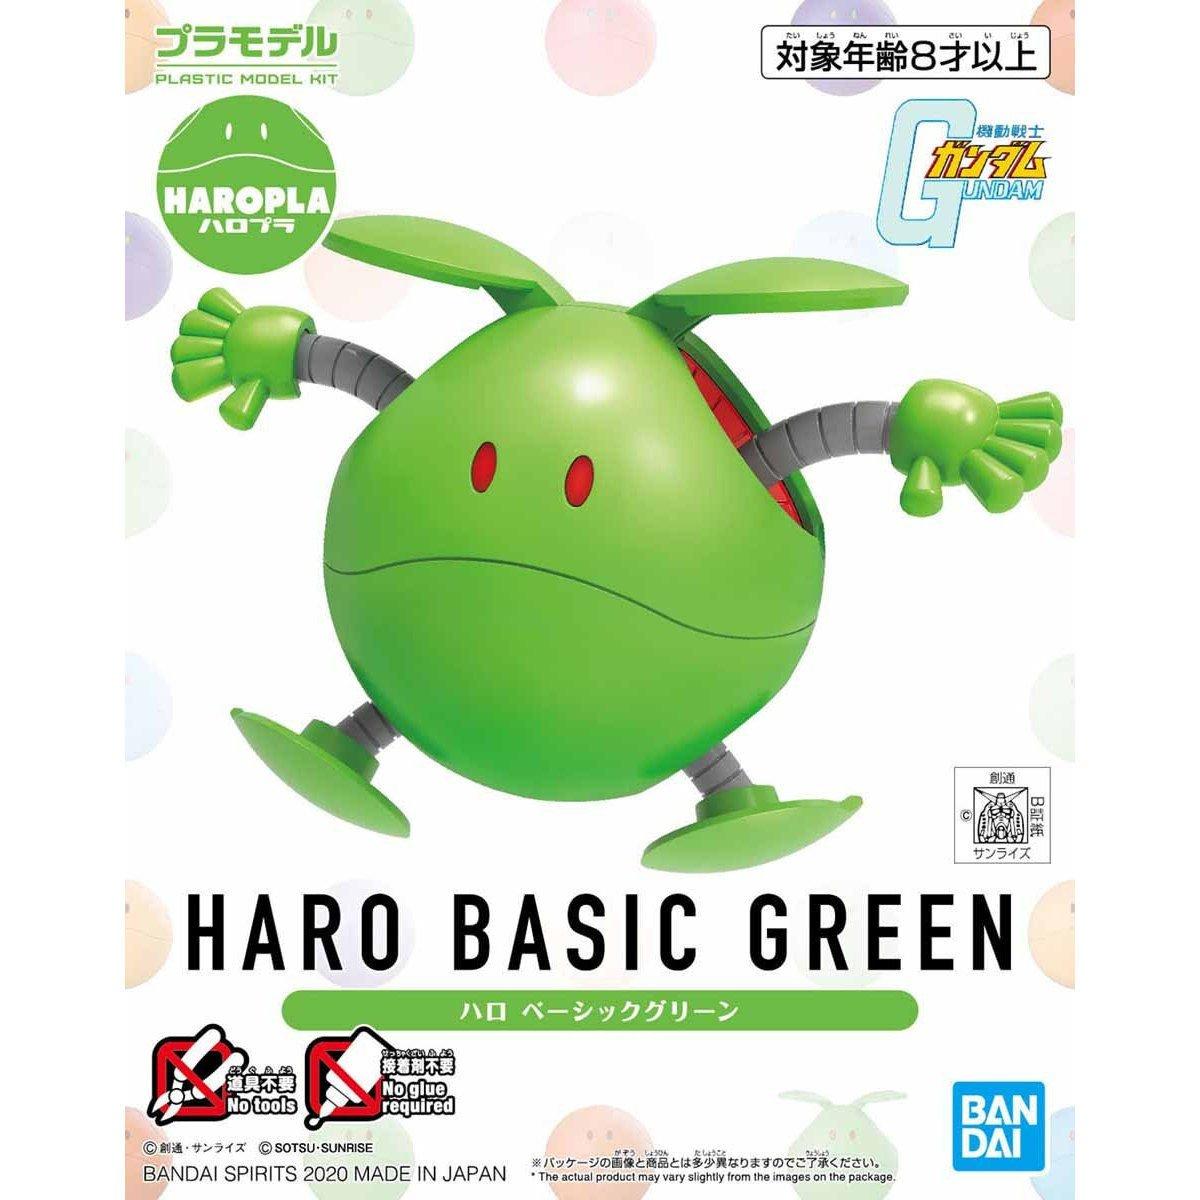 鋼彈gundam組合模型 HAROPLA #012 哈囉(經典綠)